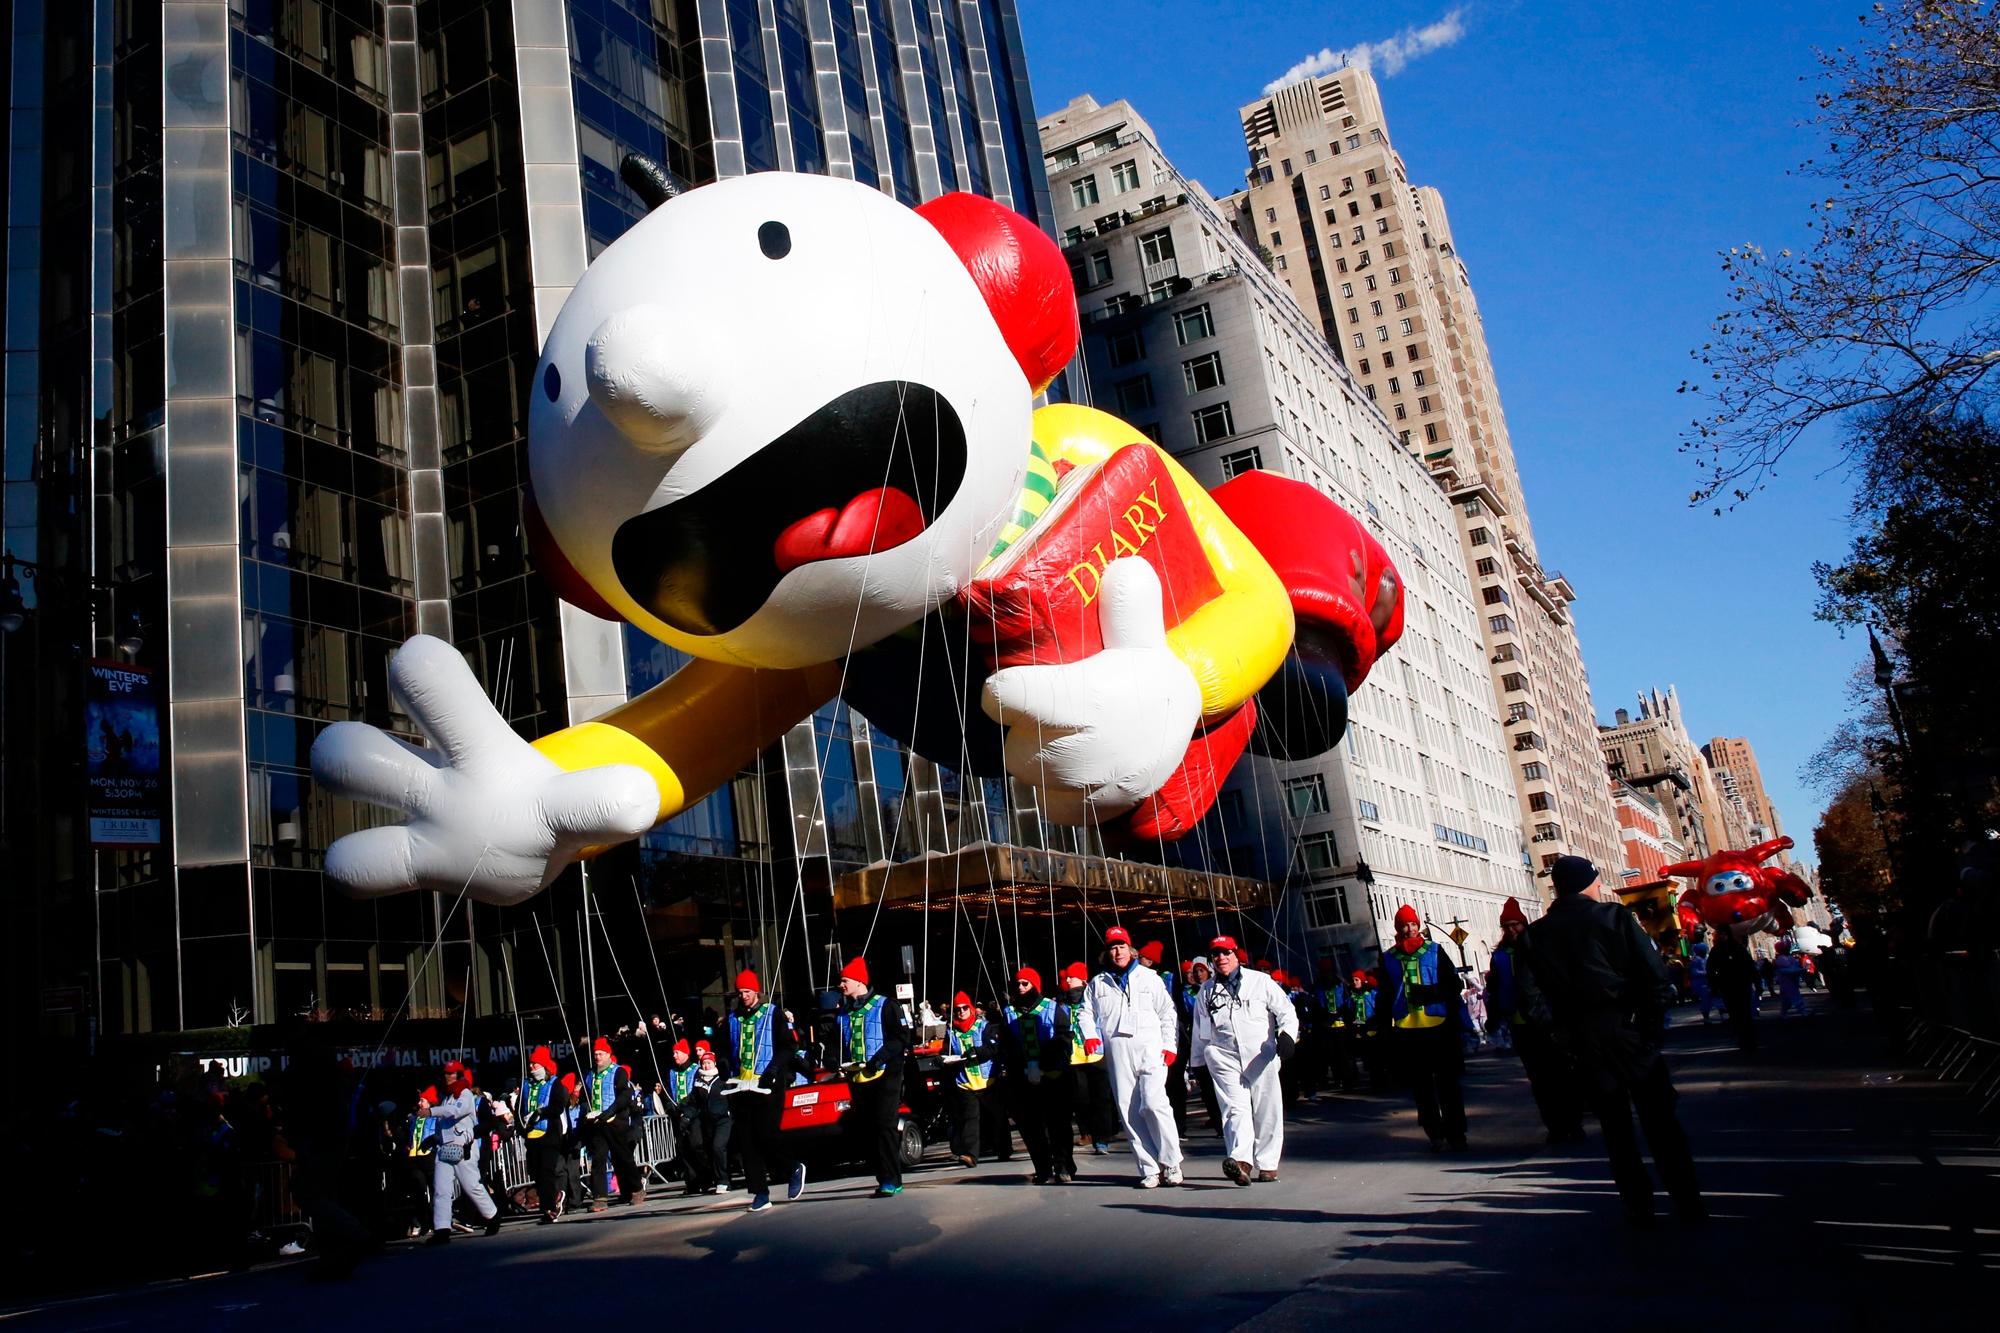 Thanksgiving Parade, New York, USA - 22 Nov 2018